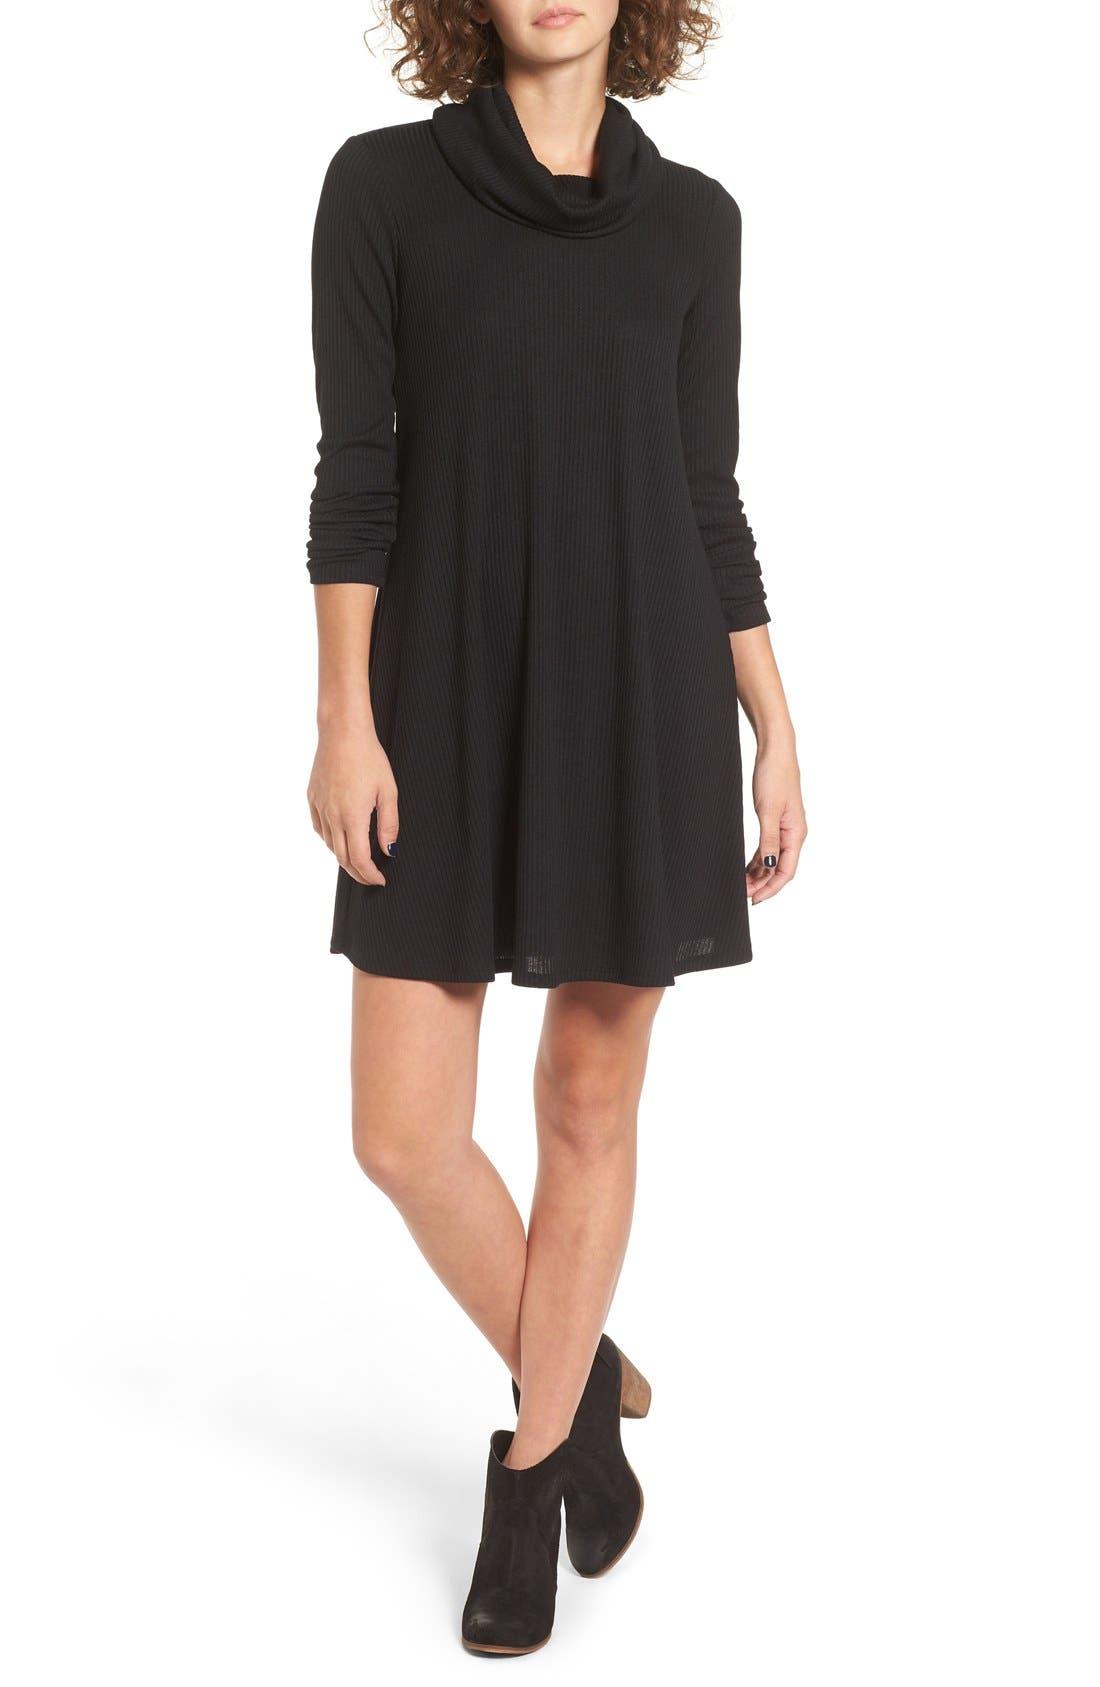 SOCIALITE Maddie Rib Knit Cowl Shift Dress, Main, color, 001